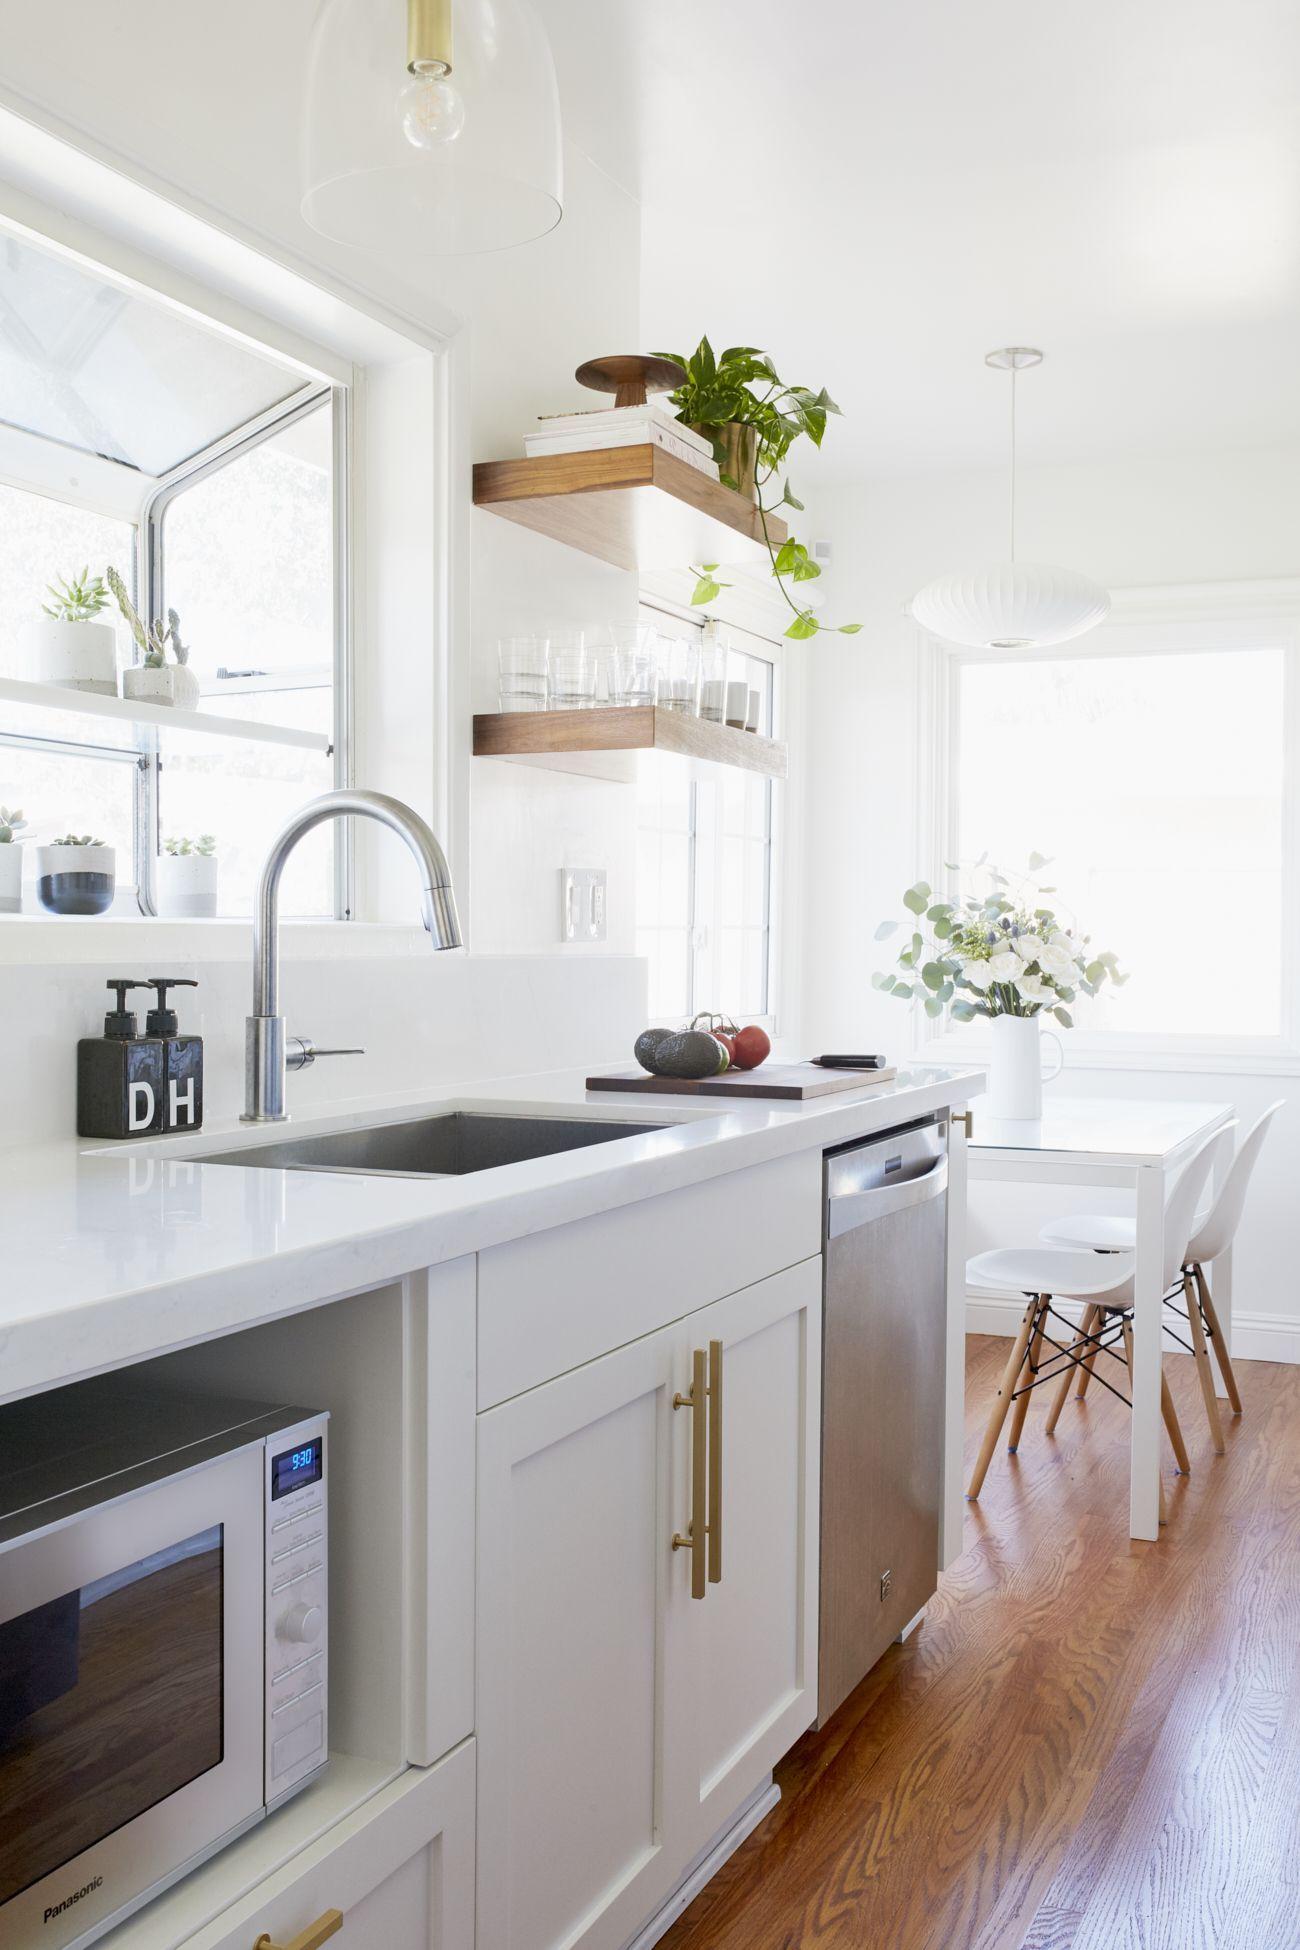 5 Innovative Kitchen Remodel Ideas | Share Home Decor Ideas ...